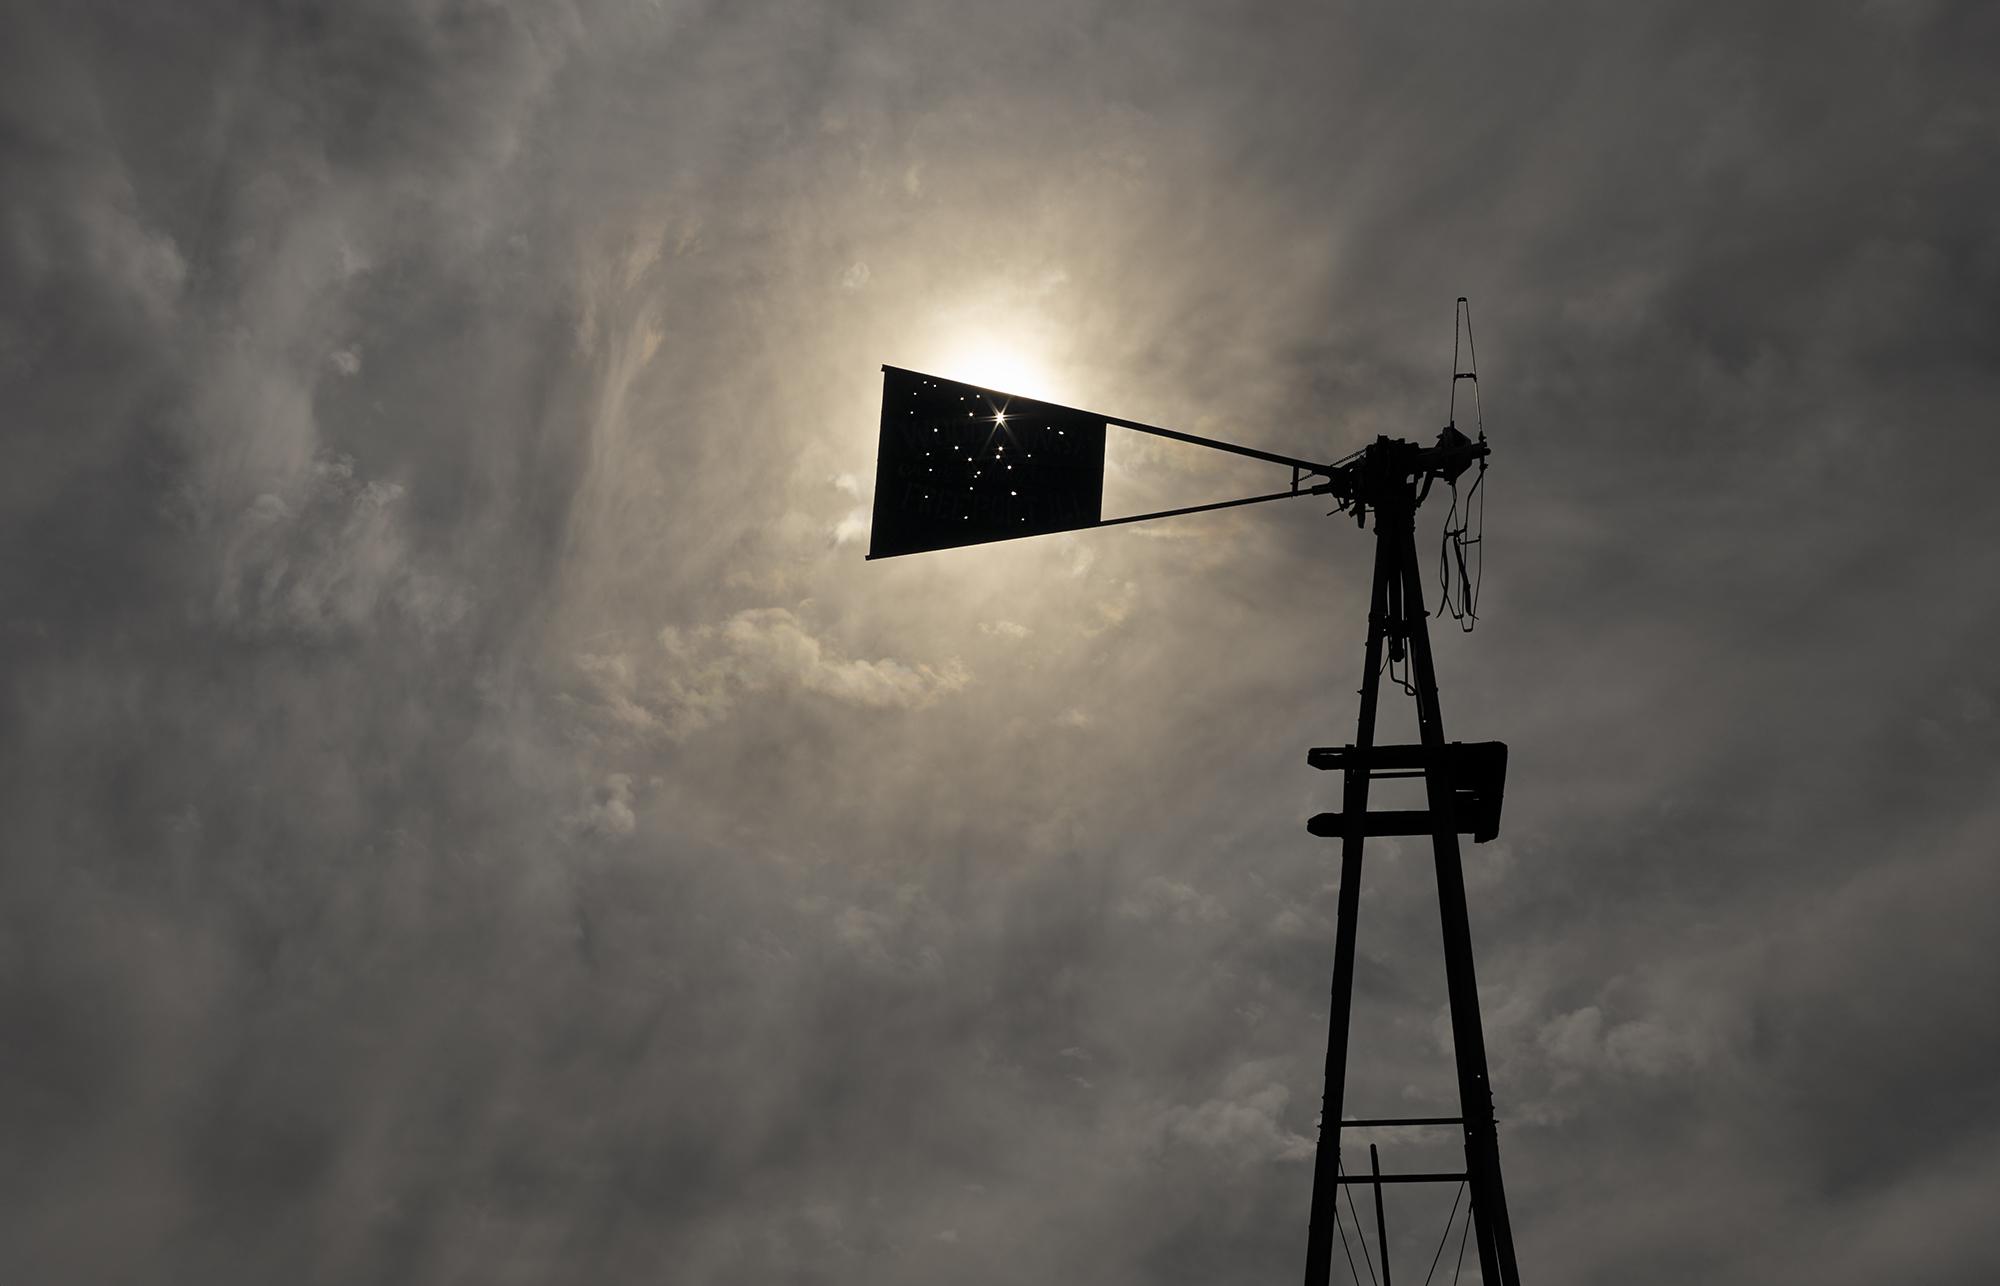 Abandoned windmill, Bates Well, Cabeza Prieta, 2013